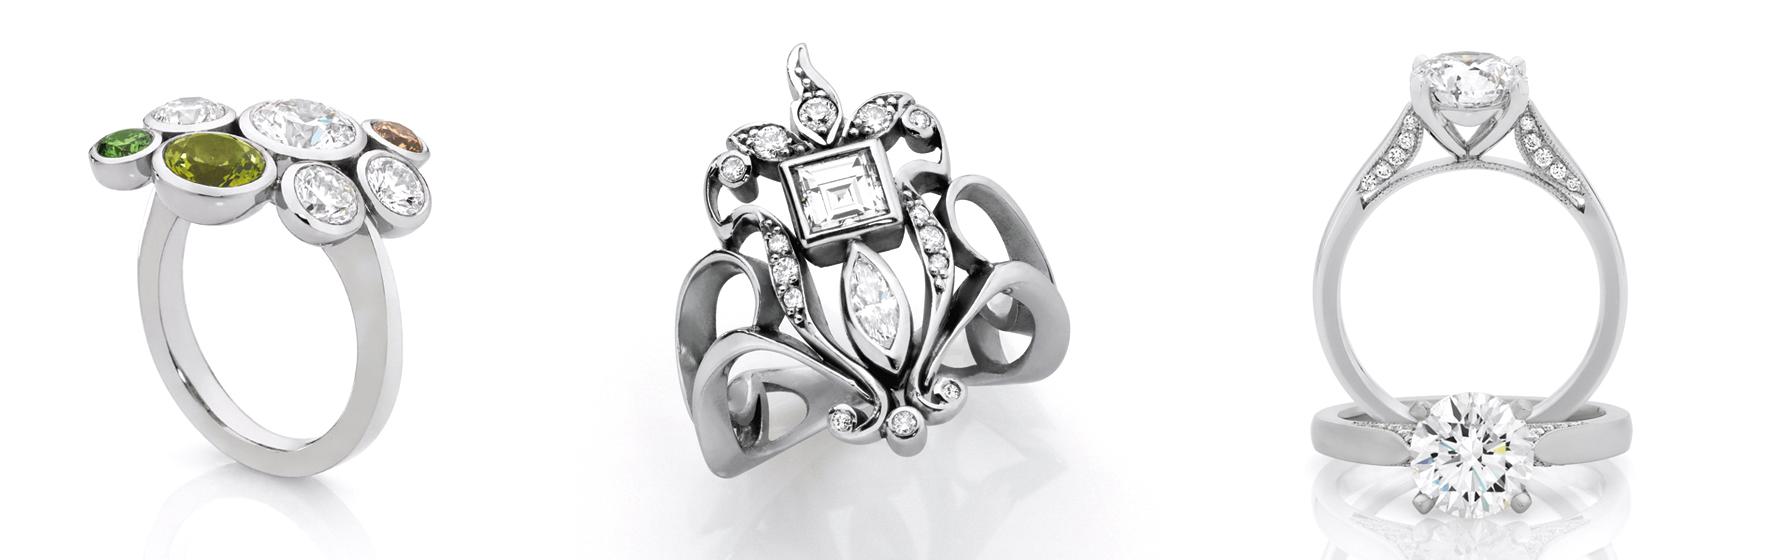 bespoke_diamond_rings